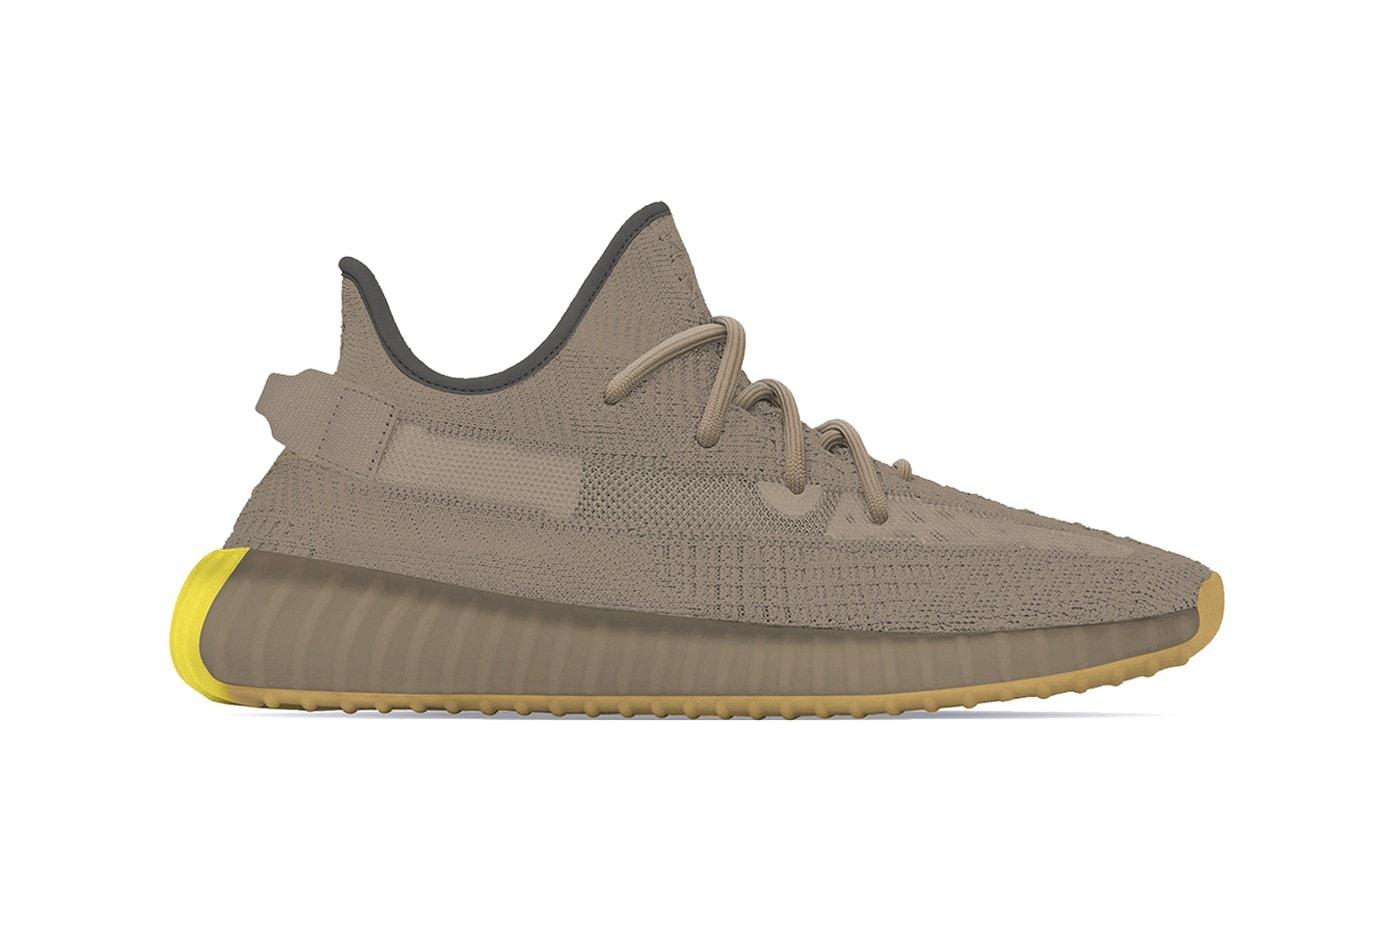 adidas YEEZY 鞋款系列 2 月份「完整發售情報」率先整理 (UPDATE)